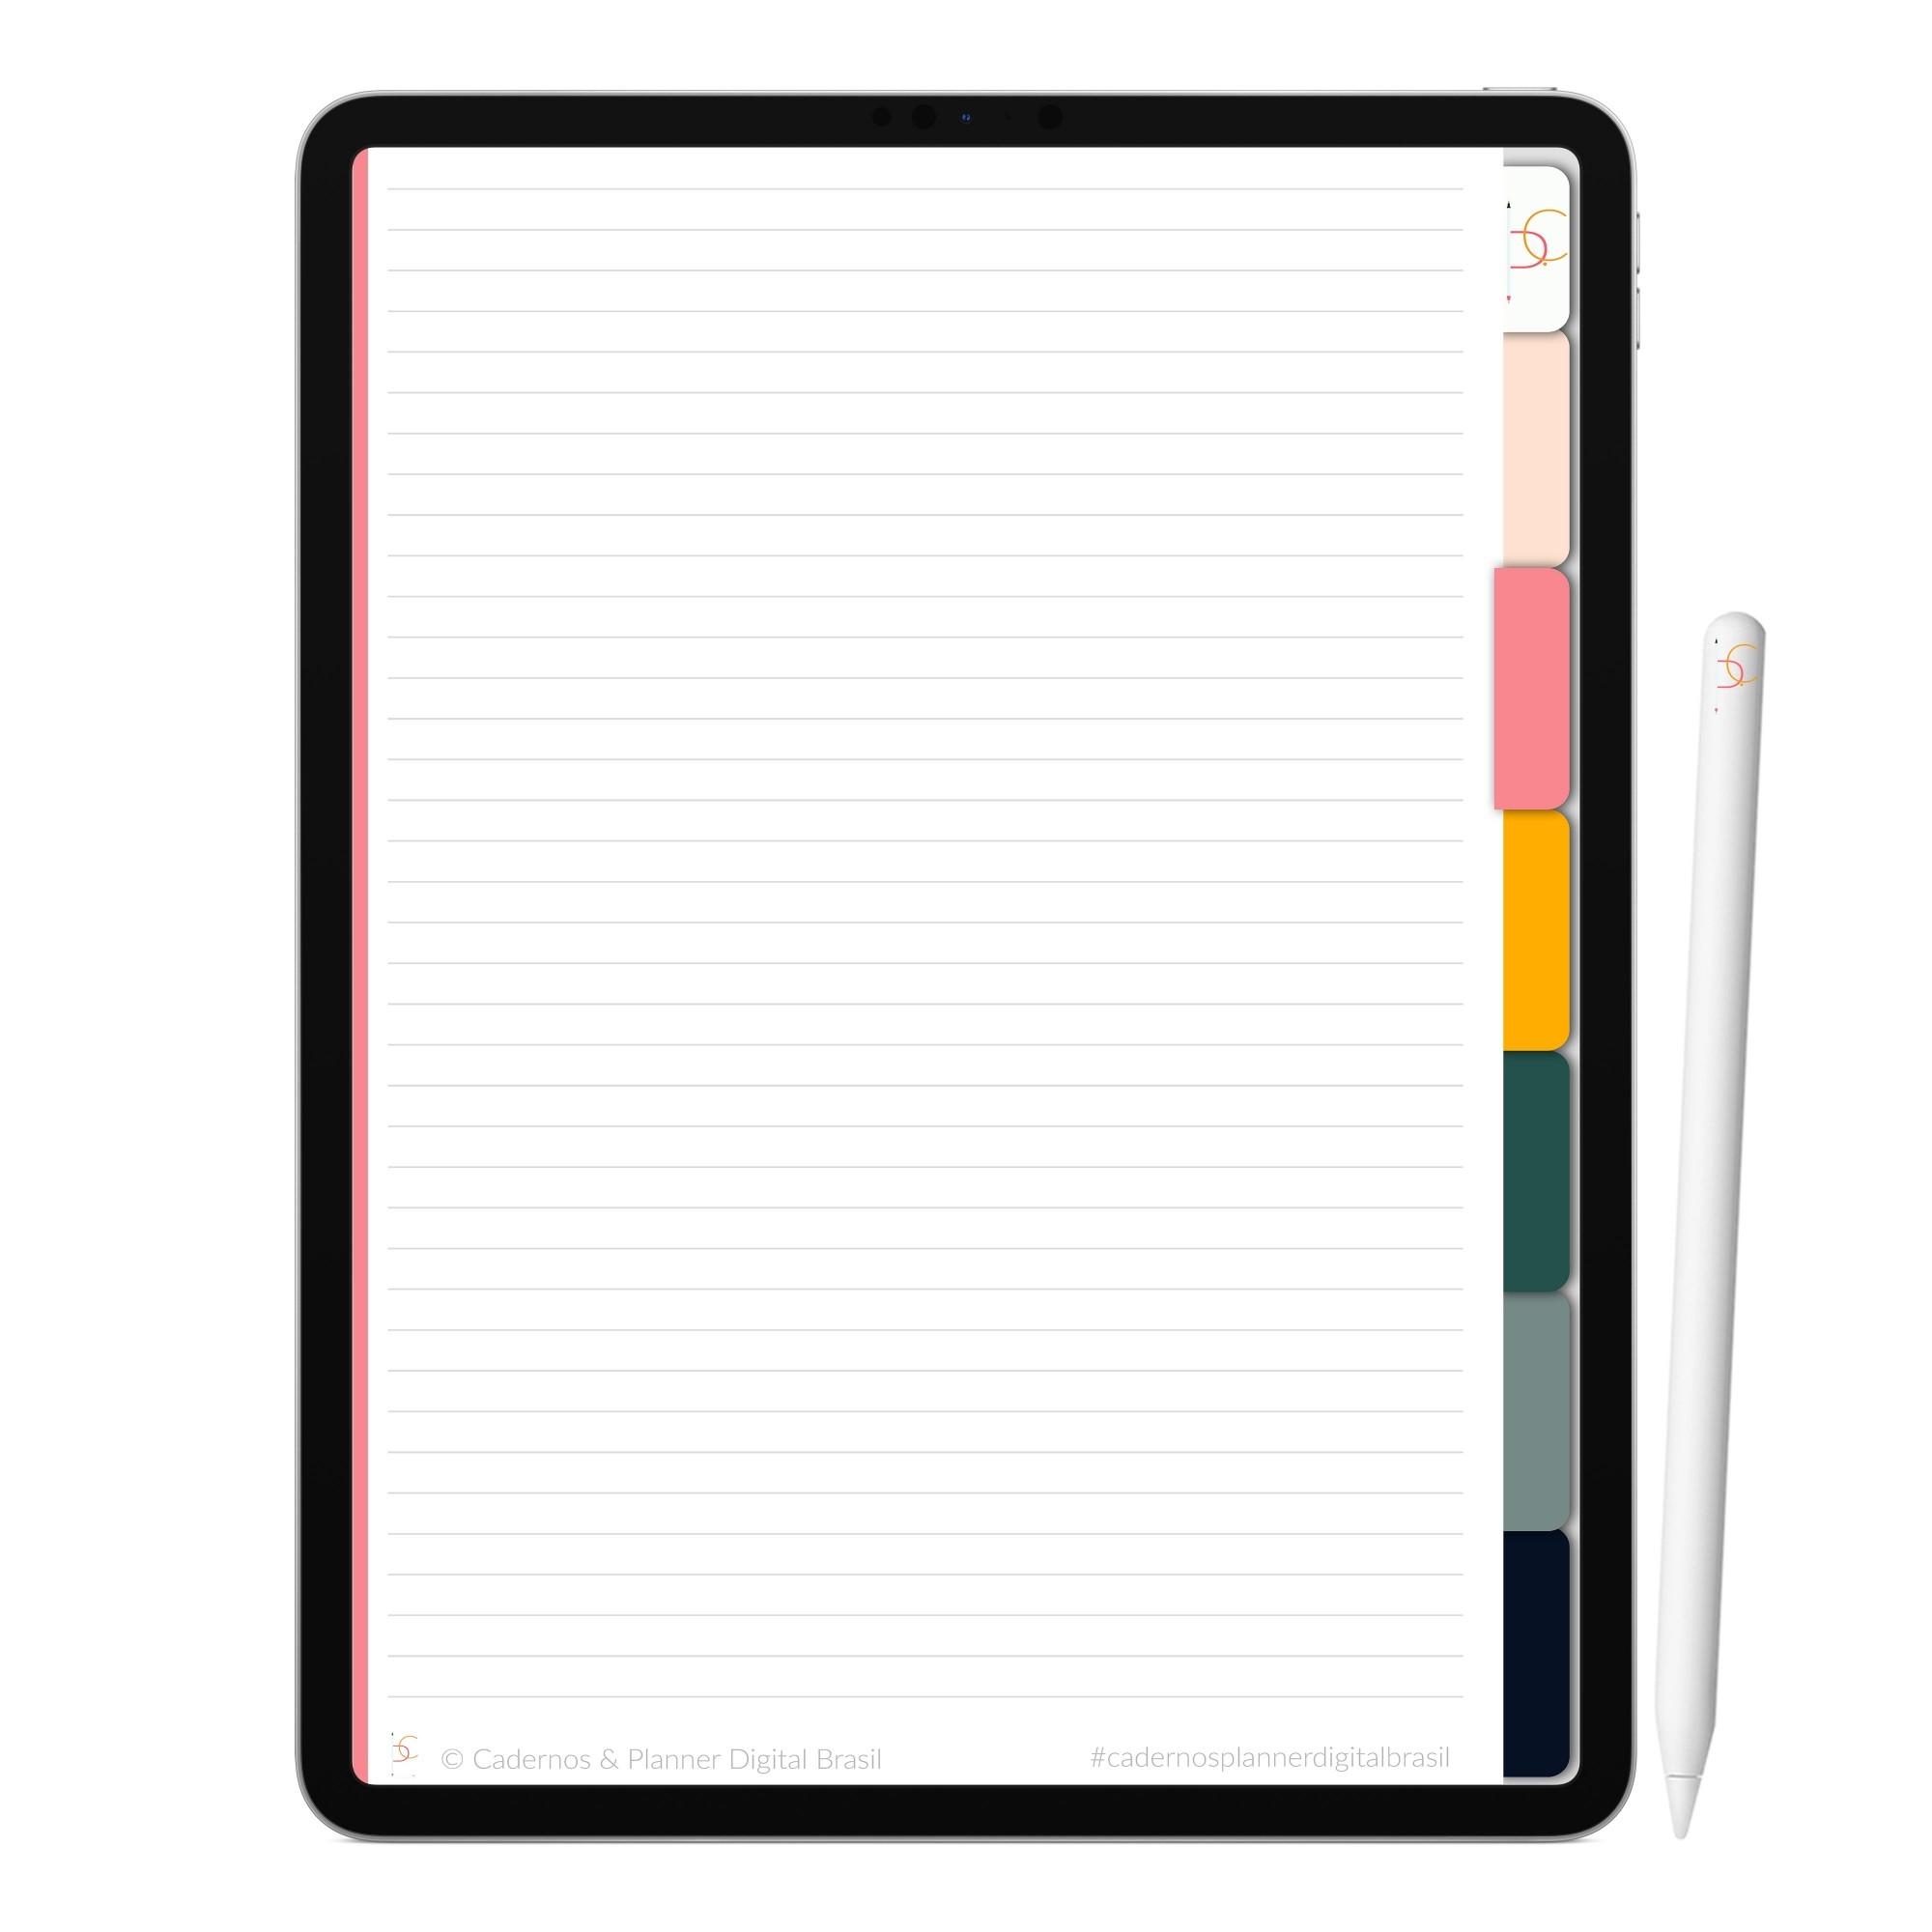 Caderno Digital Blush | Seis Divisórias Interativo| iPad Tablet | Download Instantâneo